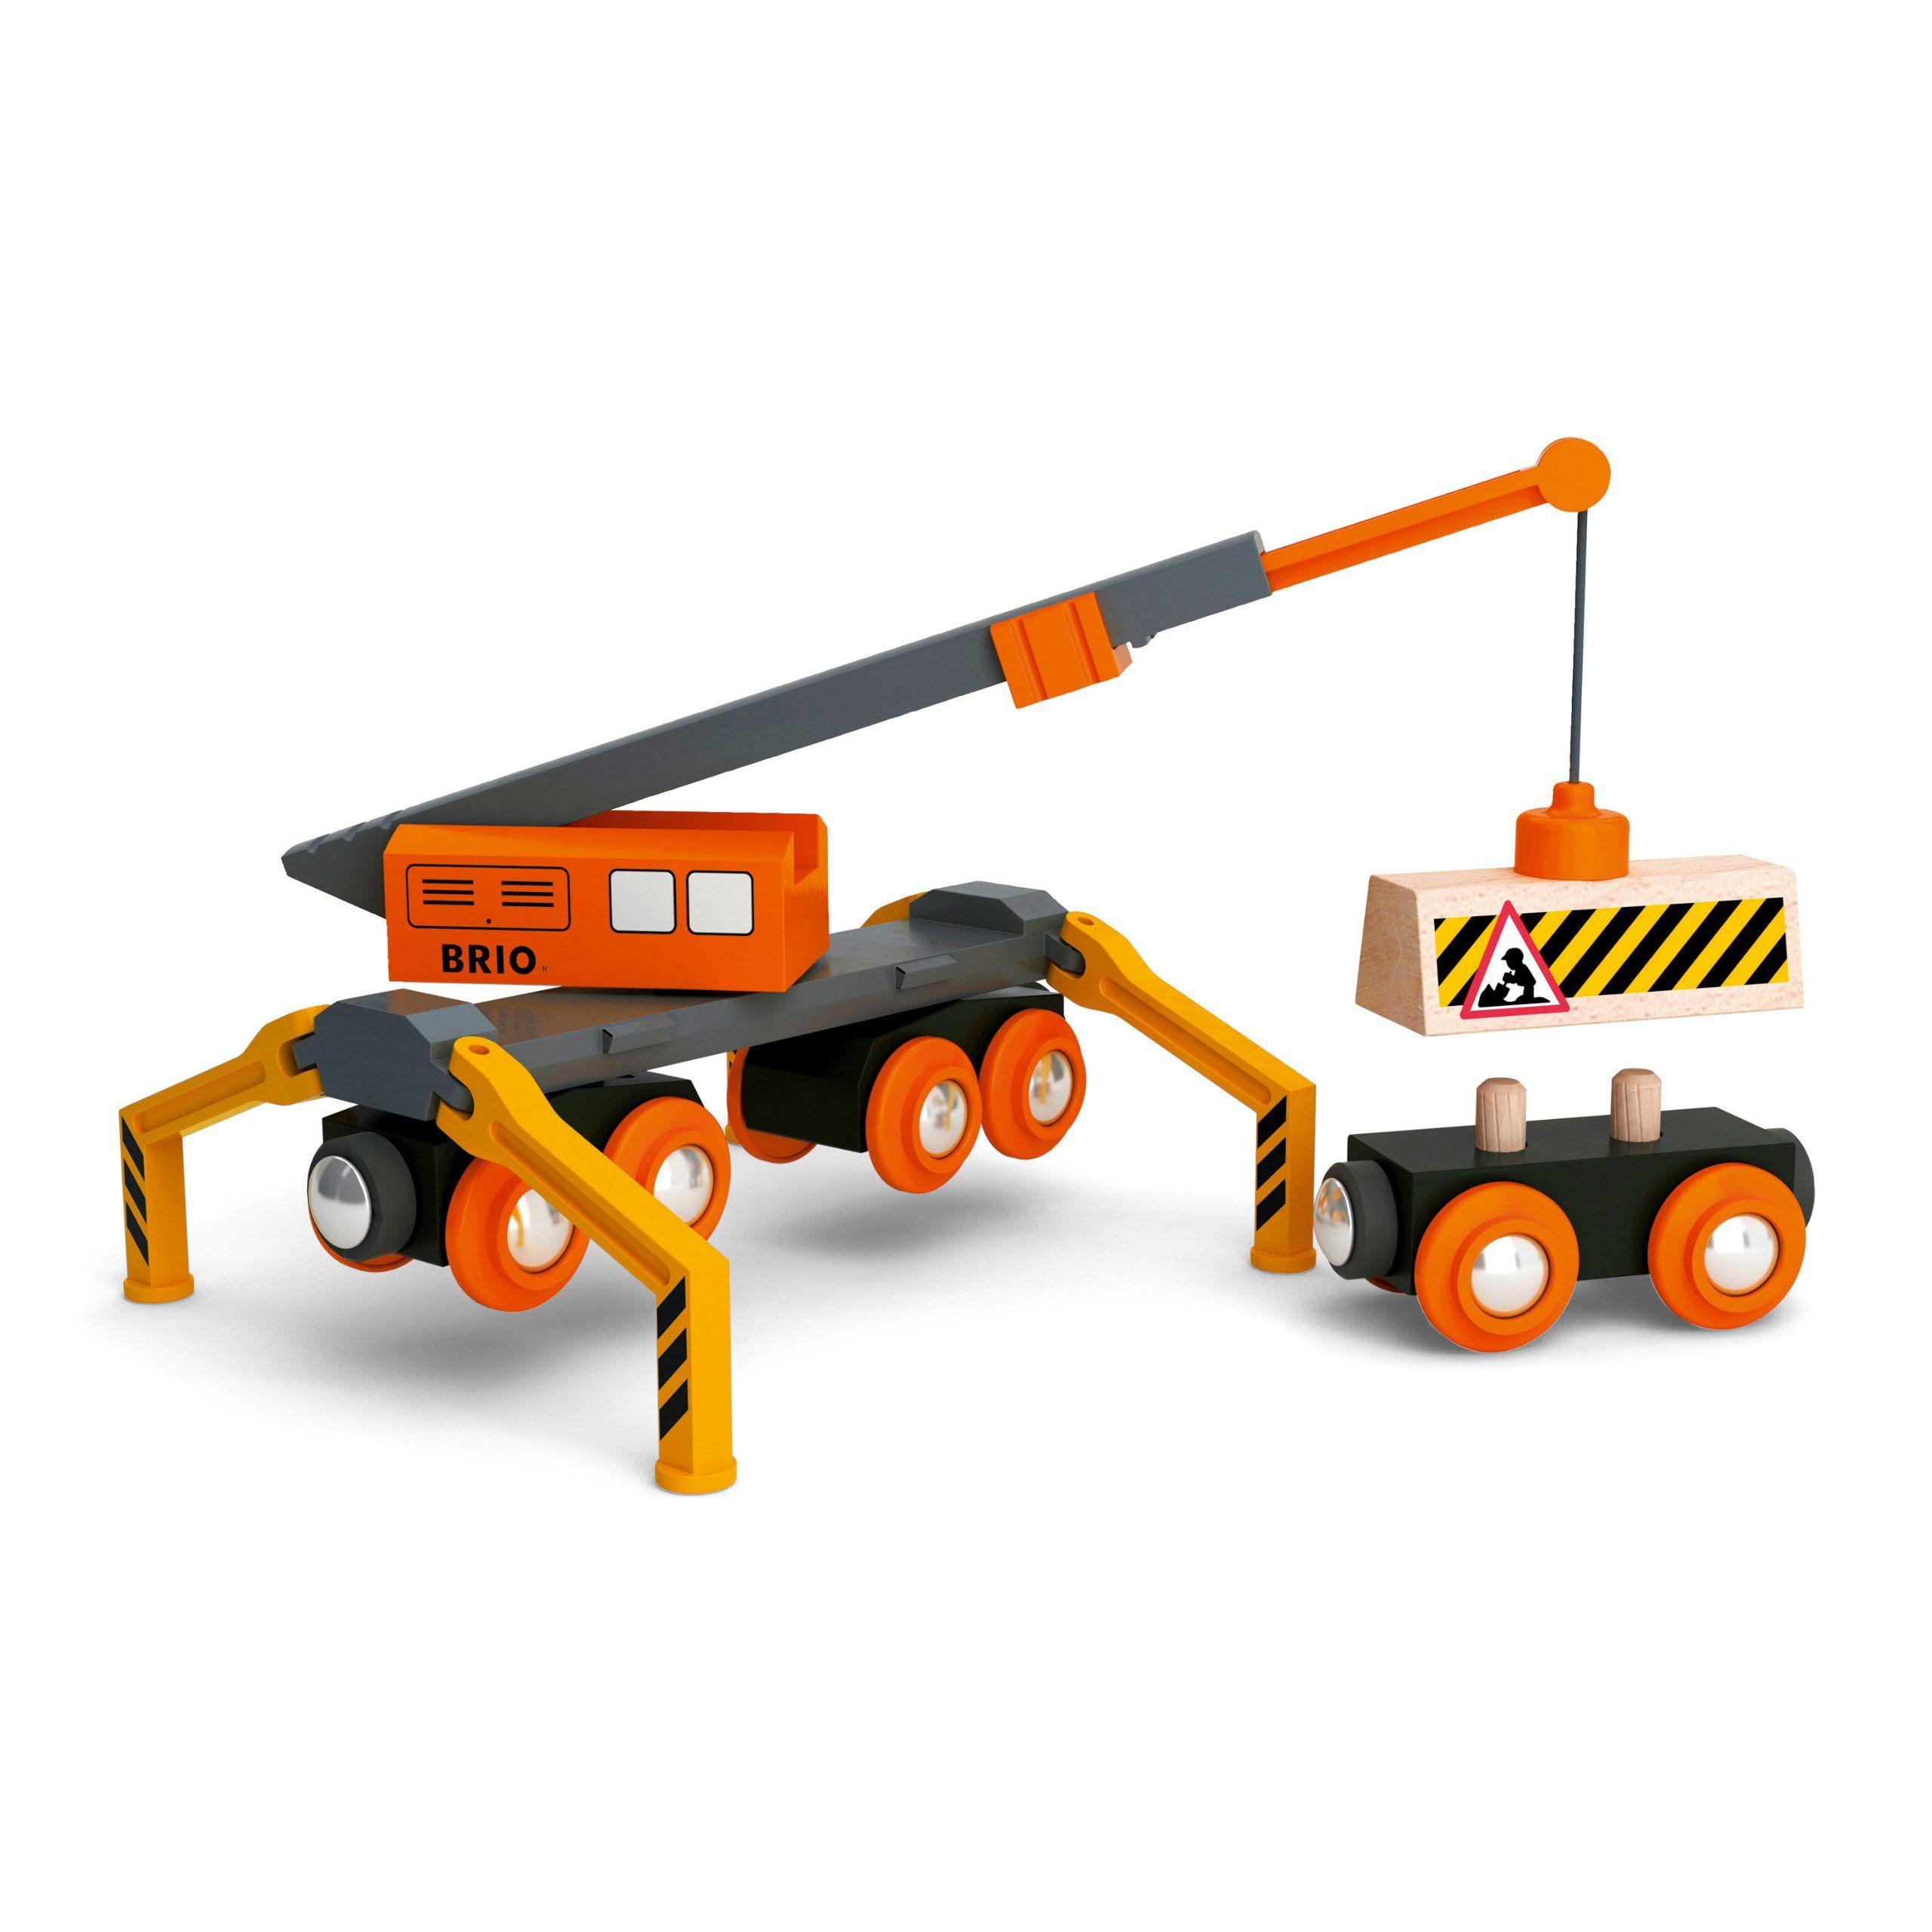 Amazoncom Brio Mega Crane Toys Games Presents For Others